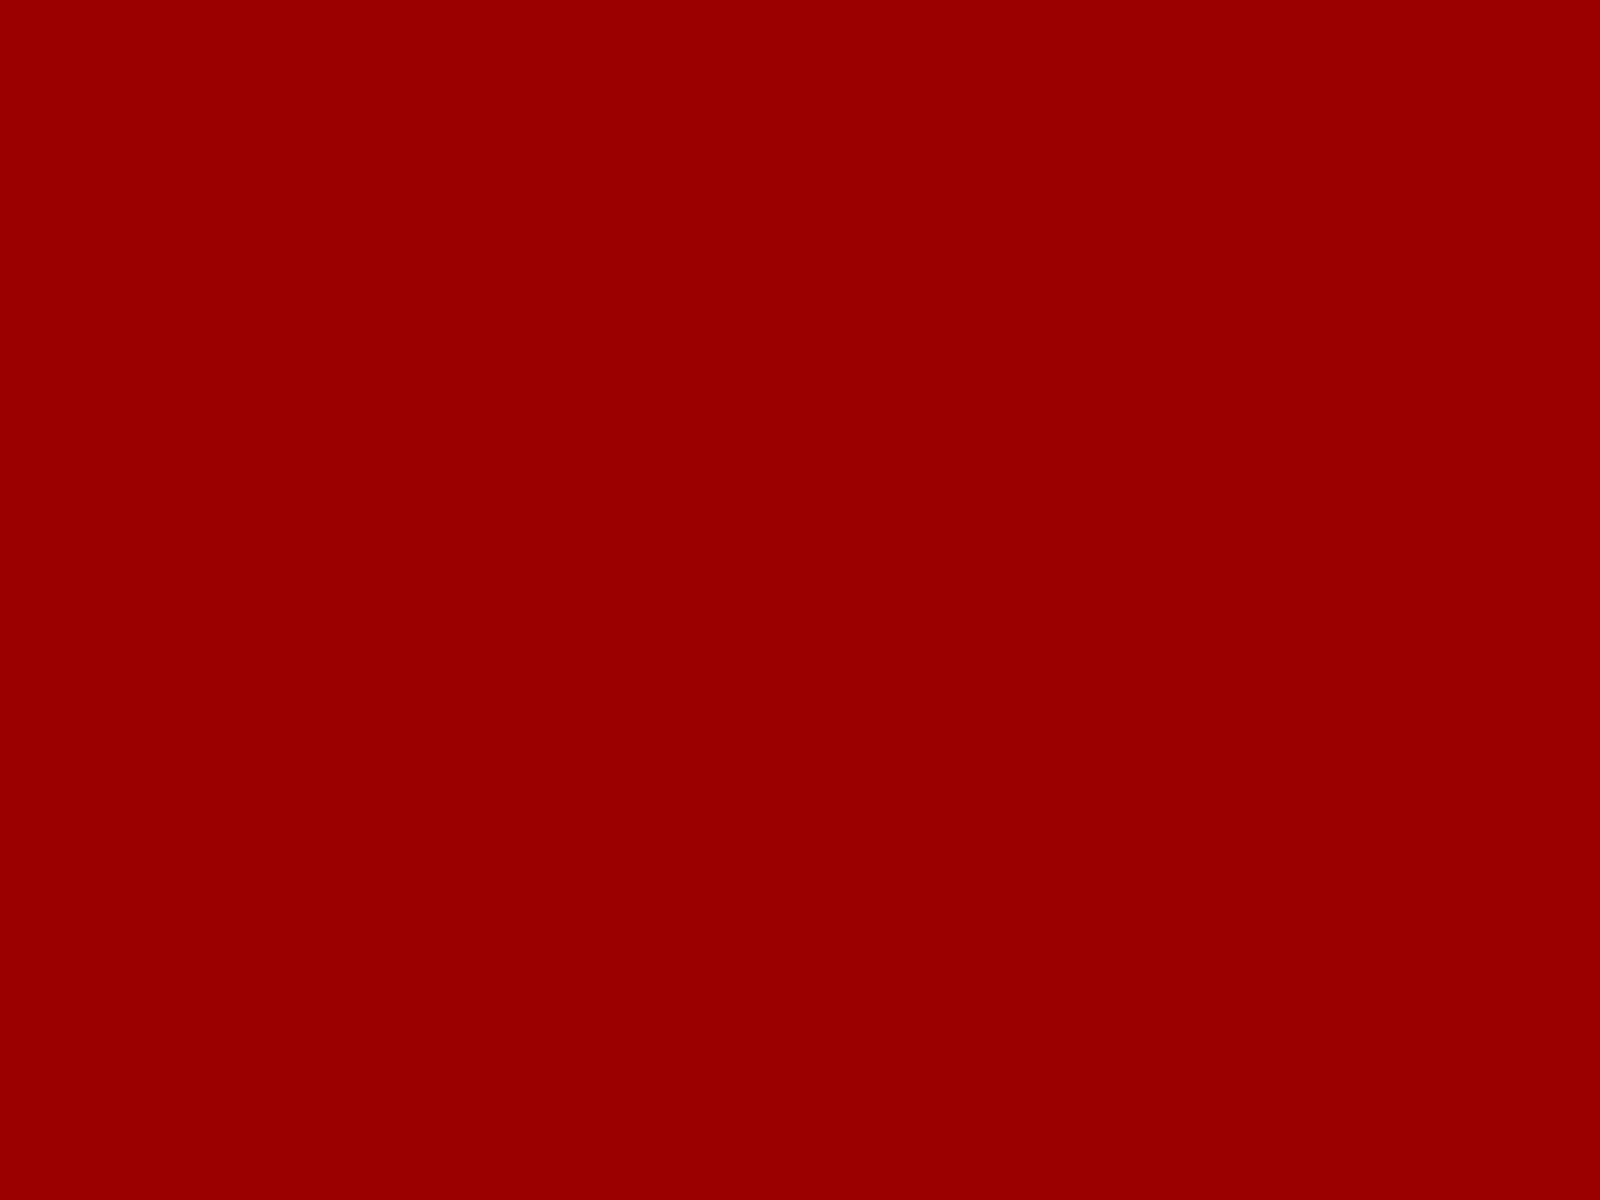 1600x1200 Stizza Solid Color Background